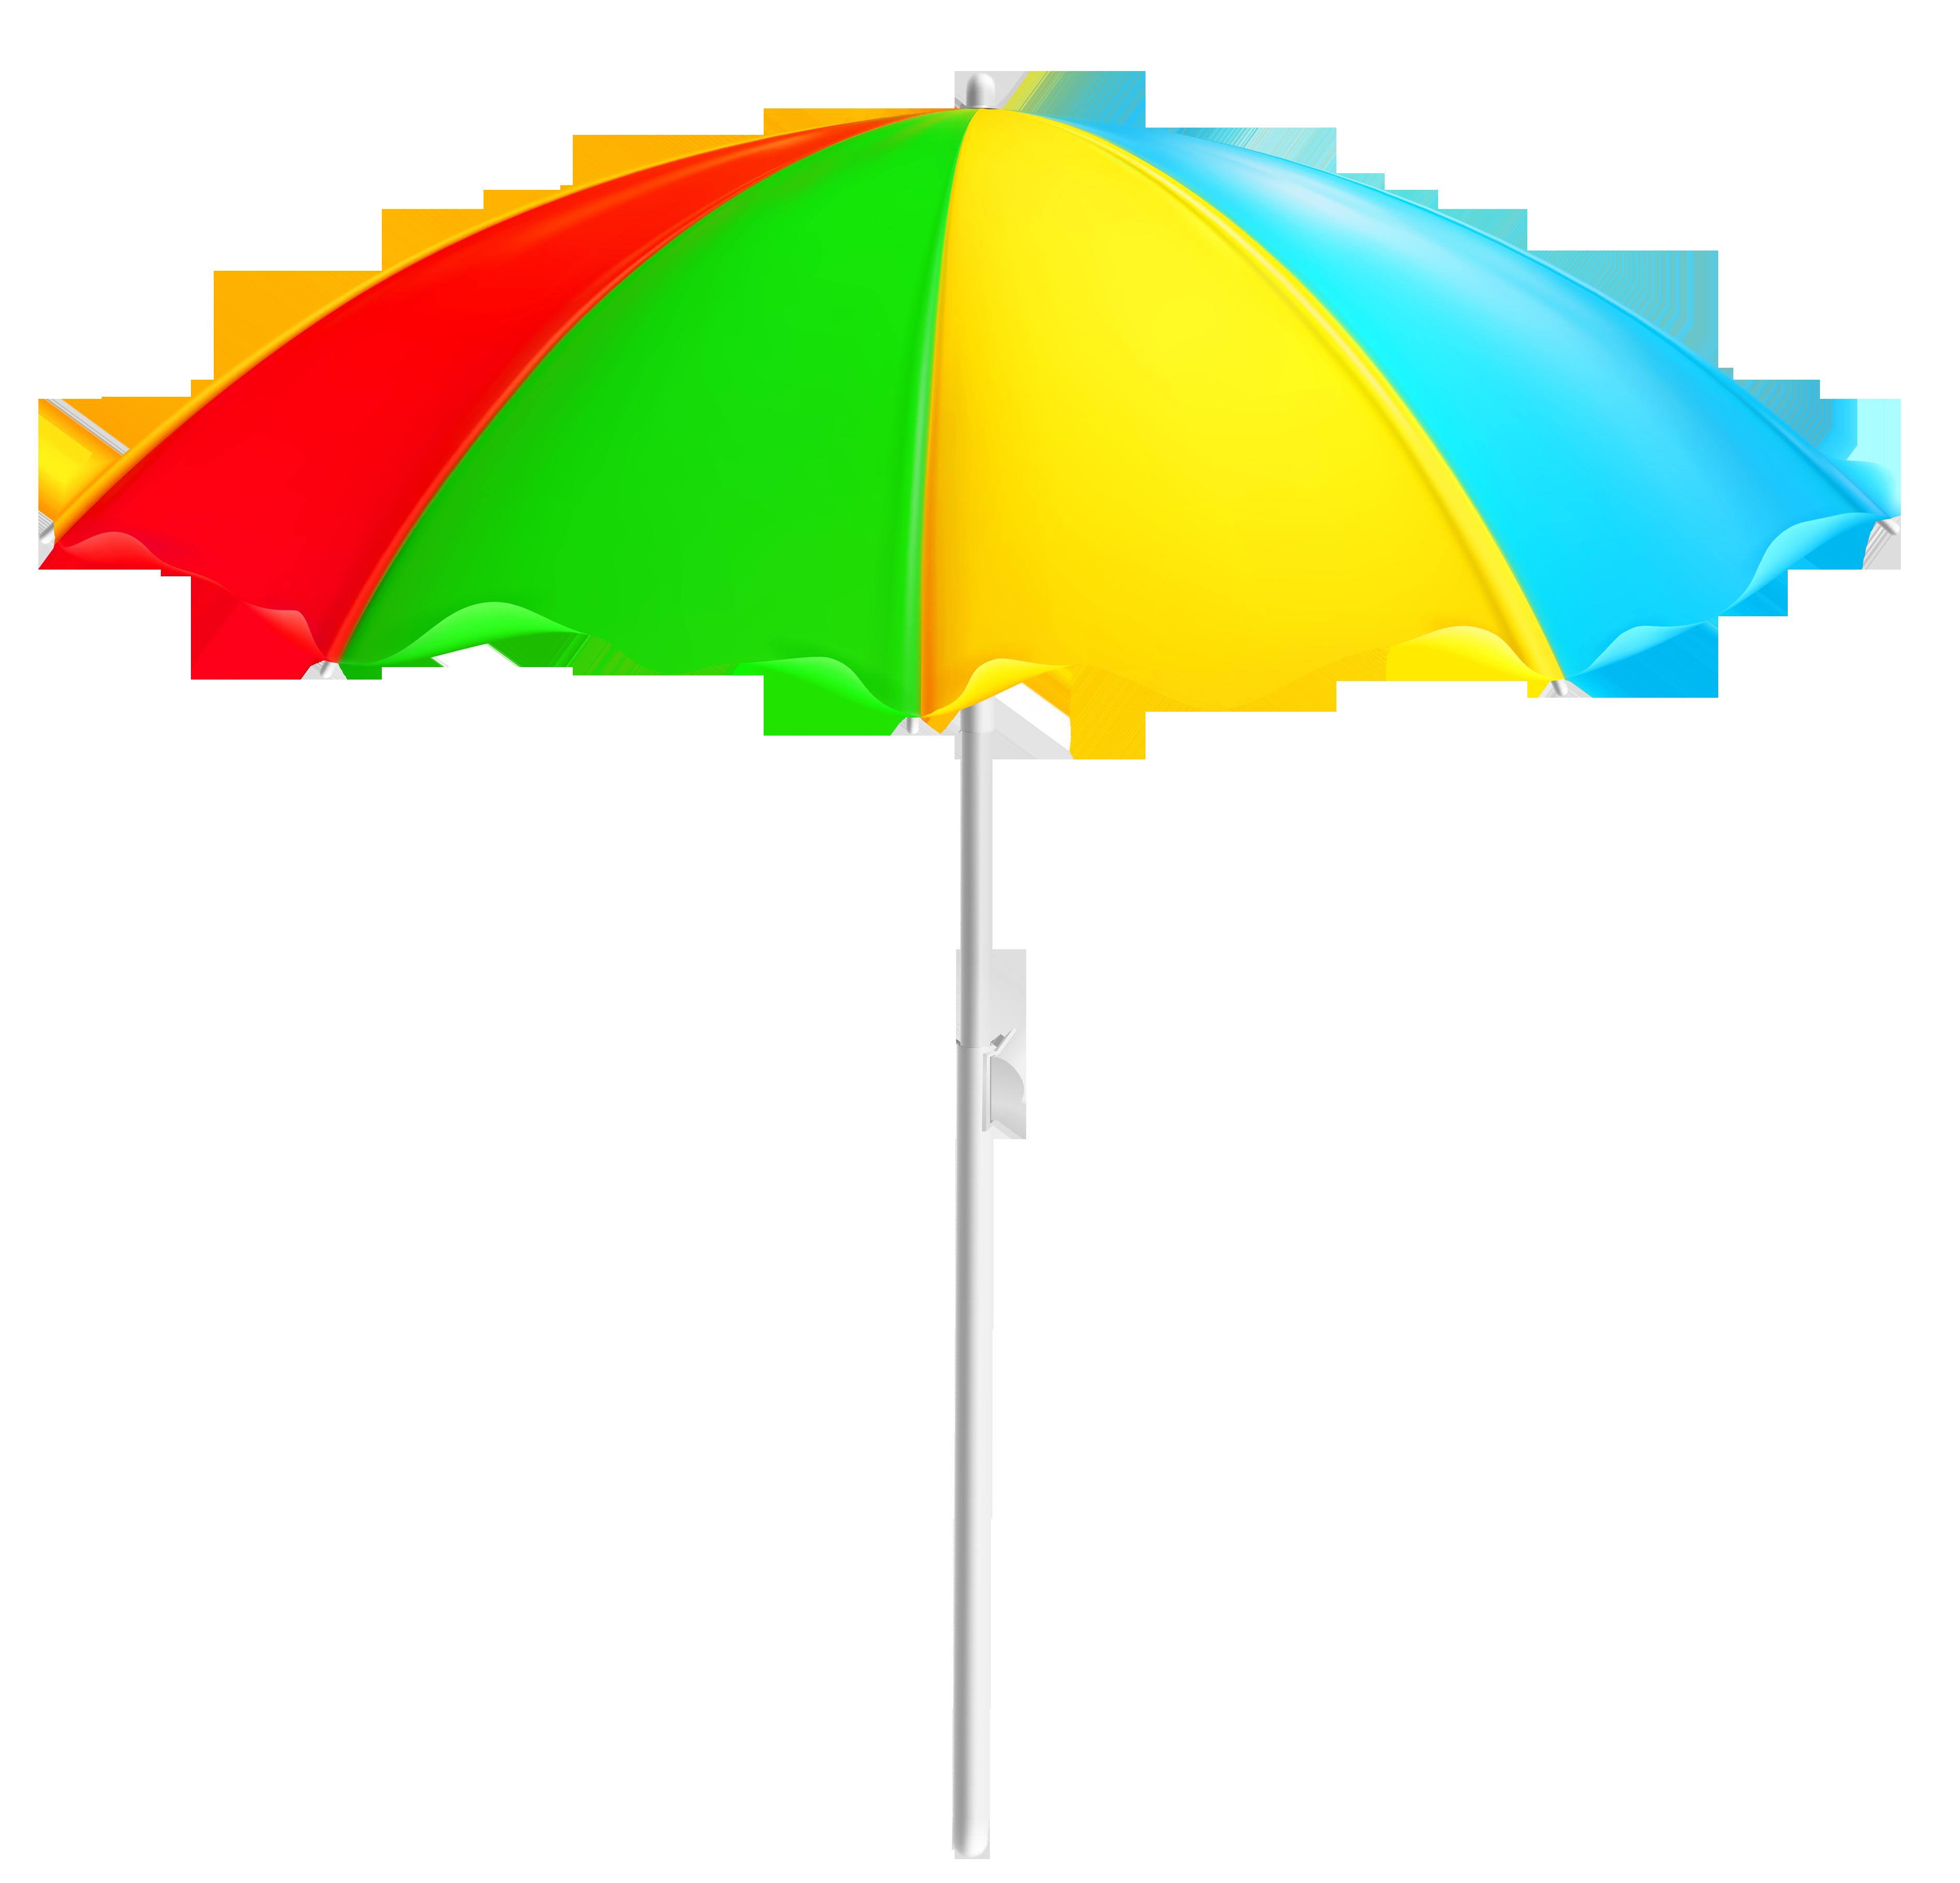 Free clipart images beach umbrella image royalty free download Free Beach Umbrella Cliparts, Download Free Clip Art, Free Clip Art ... image royalty free download